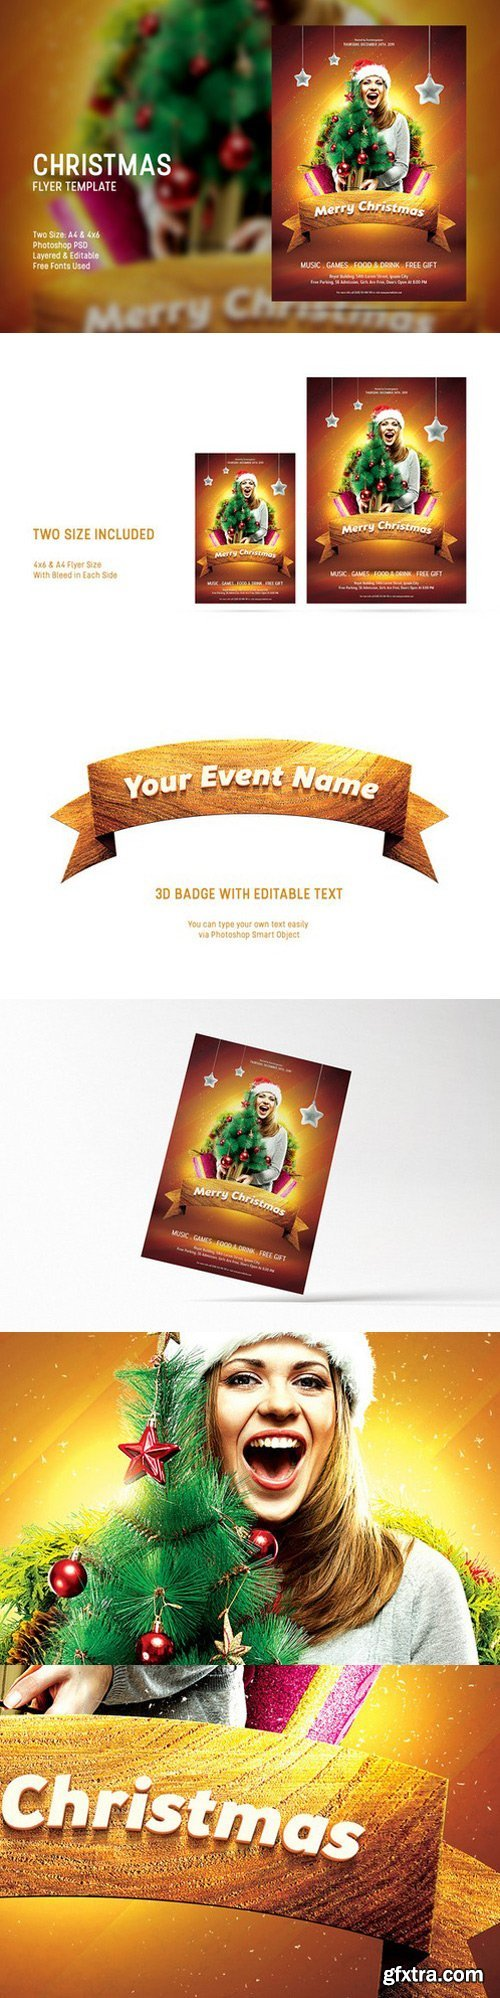 CM - Christmas Flyer Template 425712